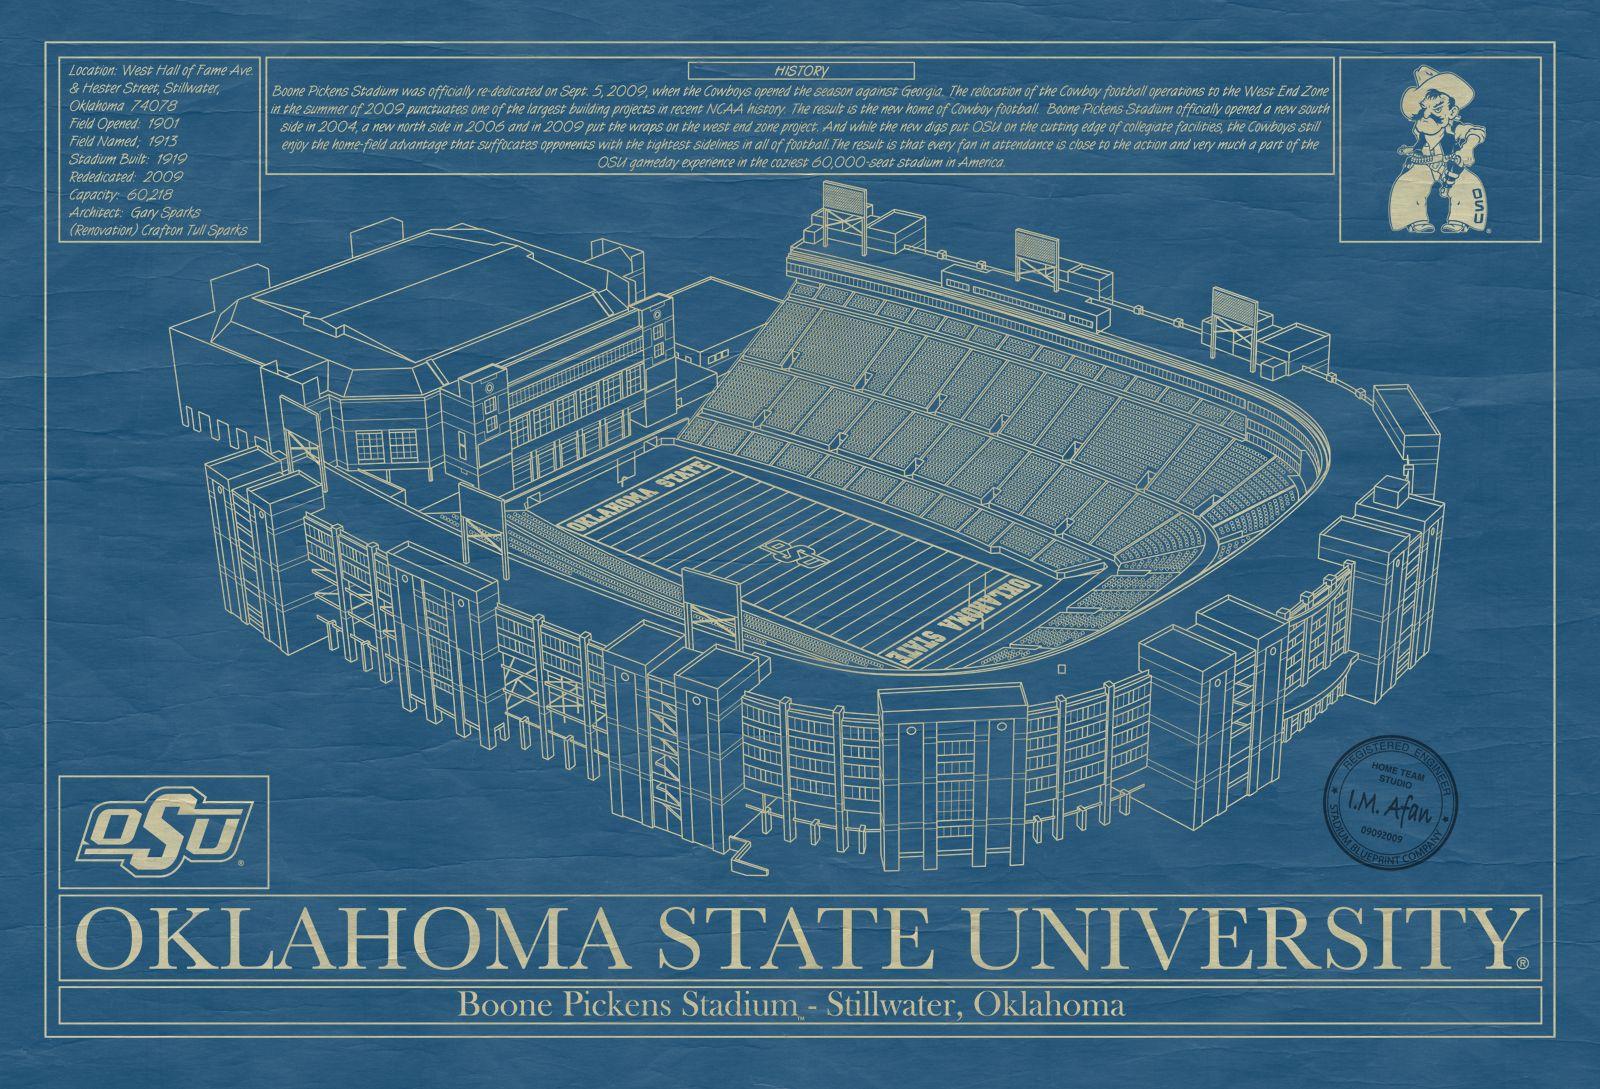 Oklahoma states boone pickens stadium as a unique blueprint style oklahoma states boone pickens stadium as a unique blueprint style piece of art malvernweather Gallery